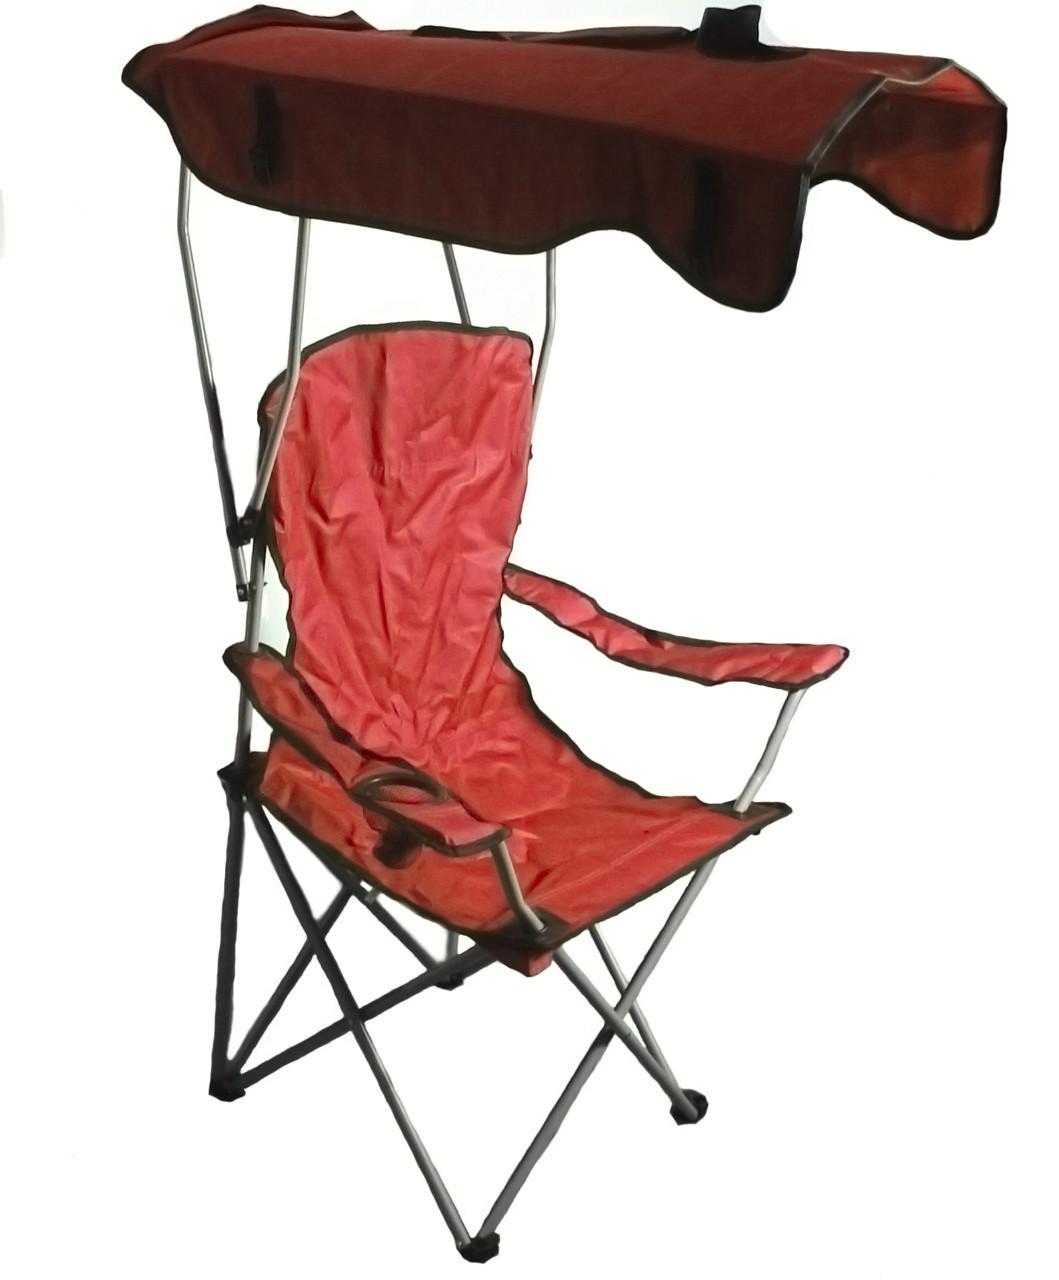 Кресло раскладное Паук с навесом R28854 50х80х124 см, красное